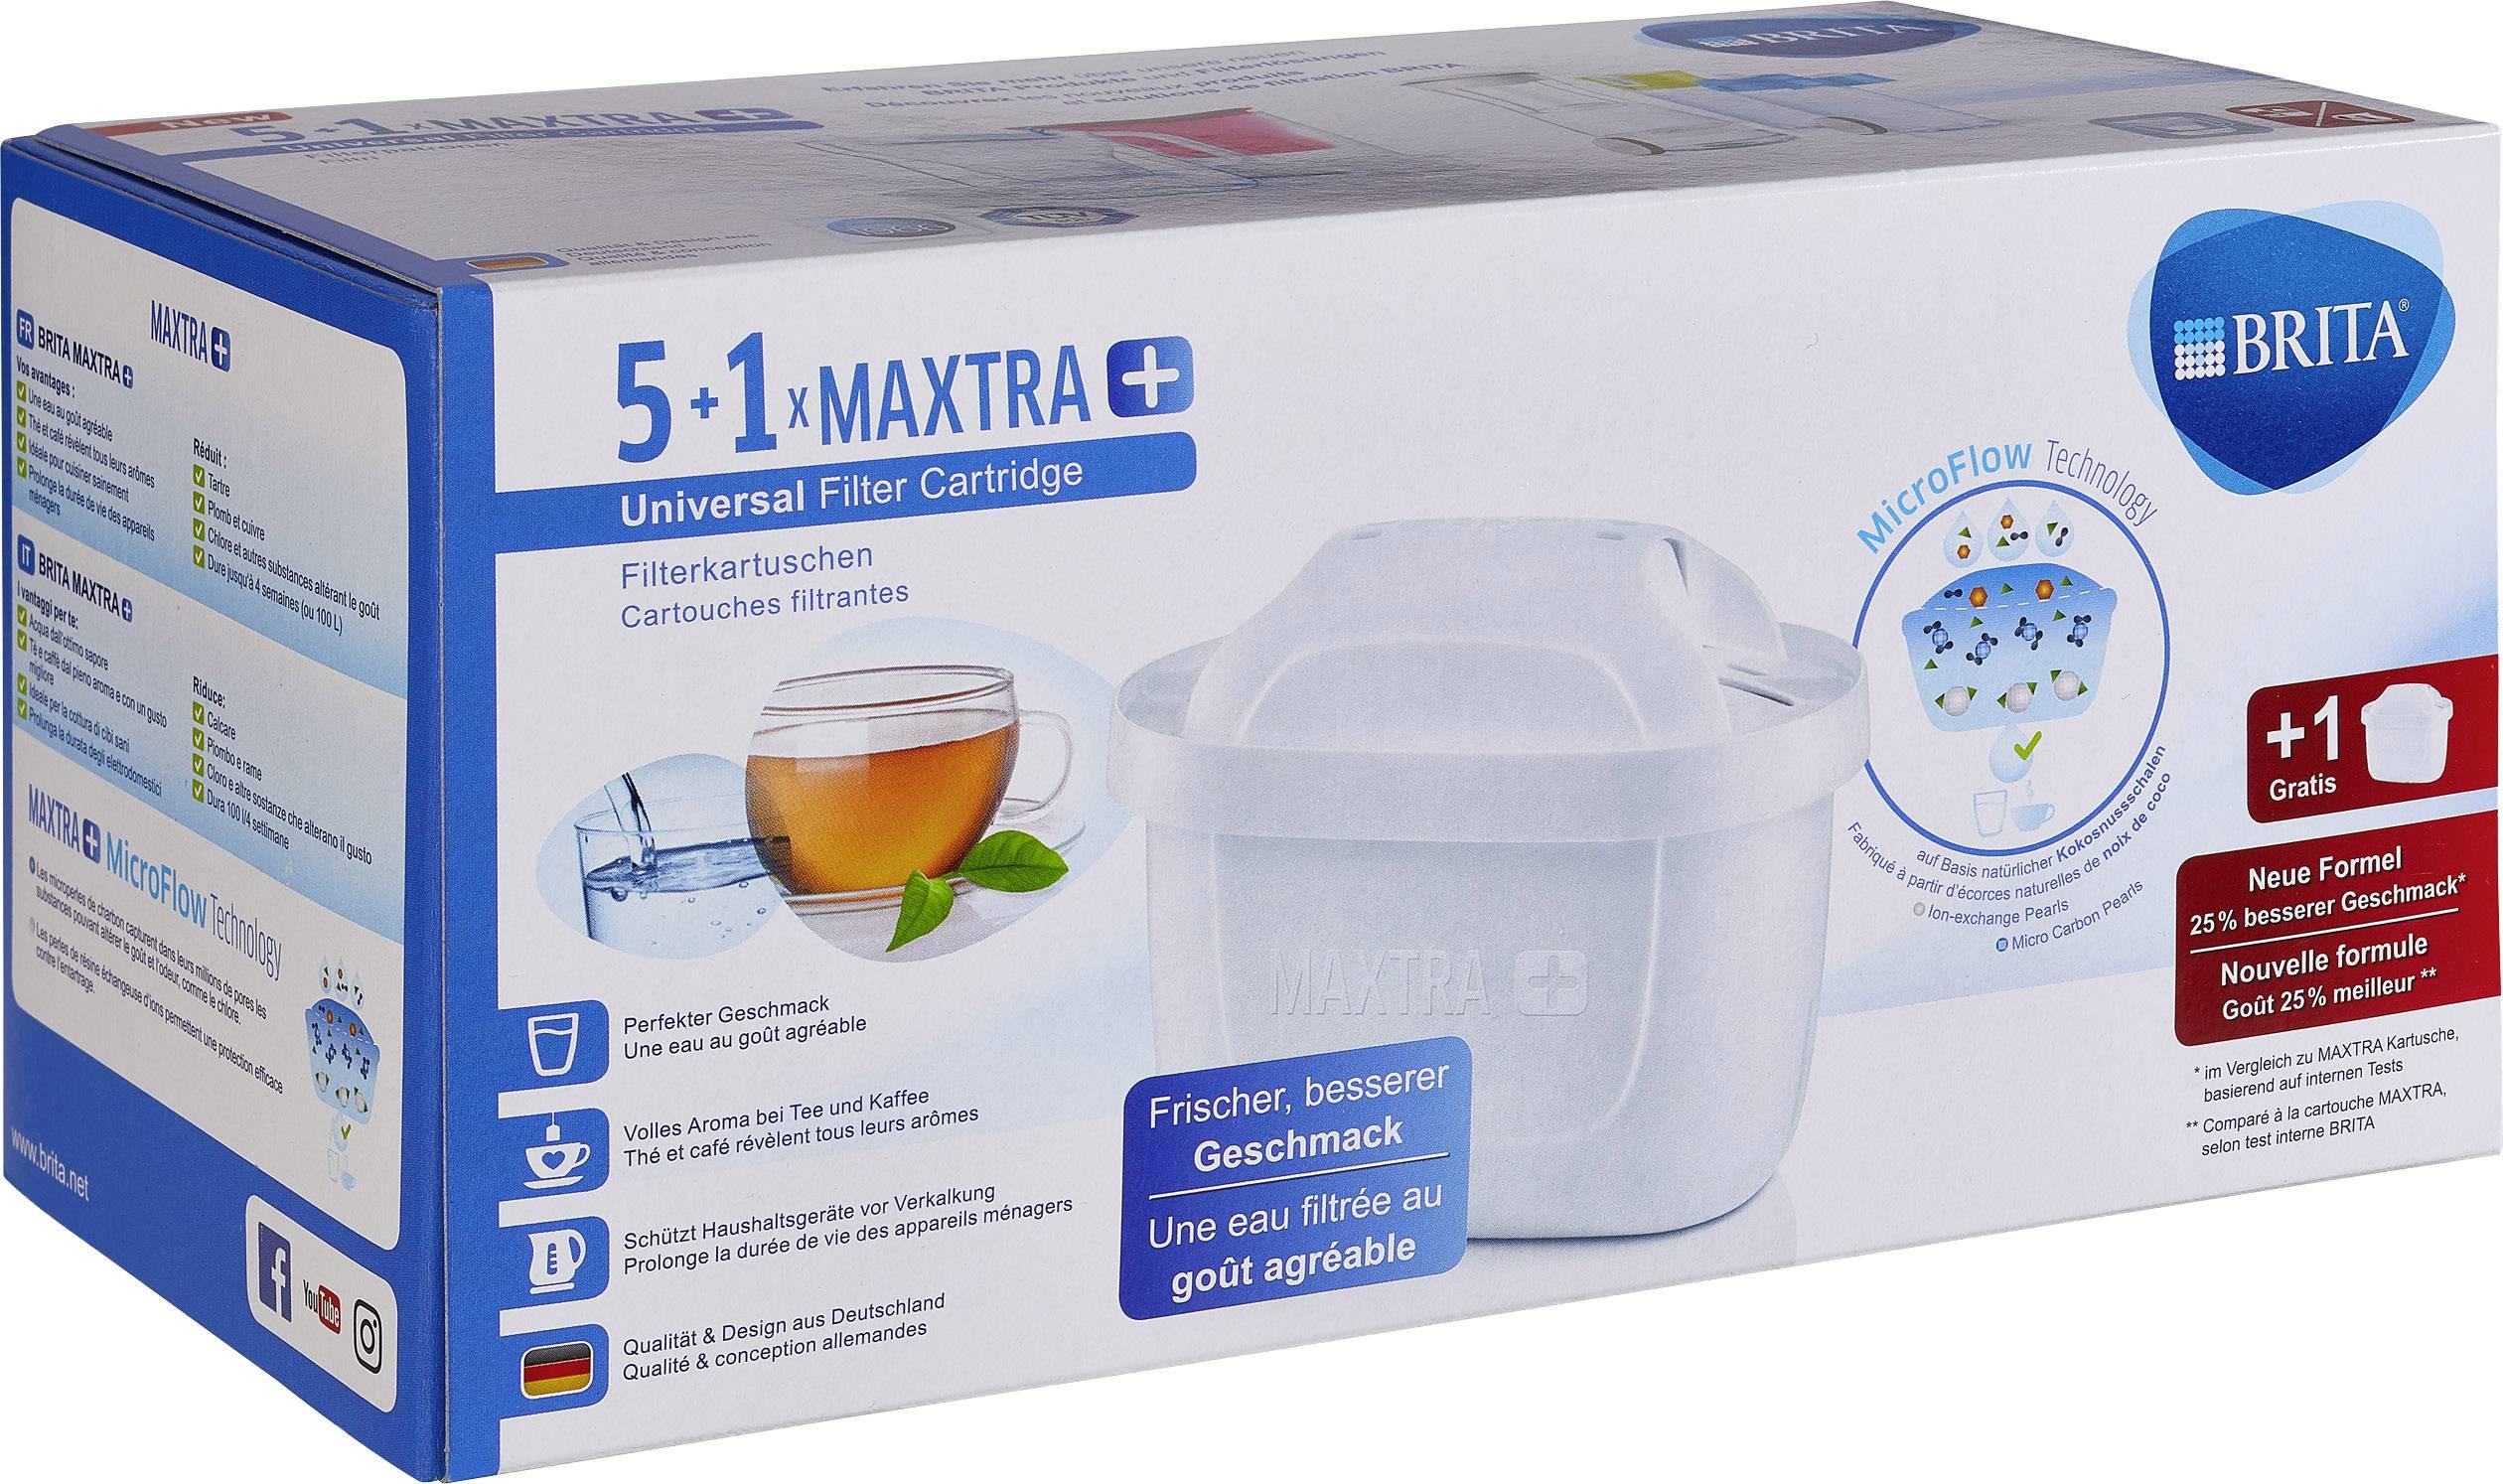 Splitter nya Filterkassett Brita Maxtra + 5+1er Pack Vit 6 st | Conrad.se DM-37